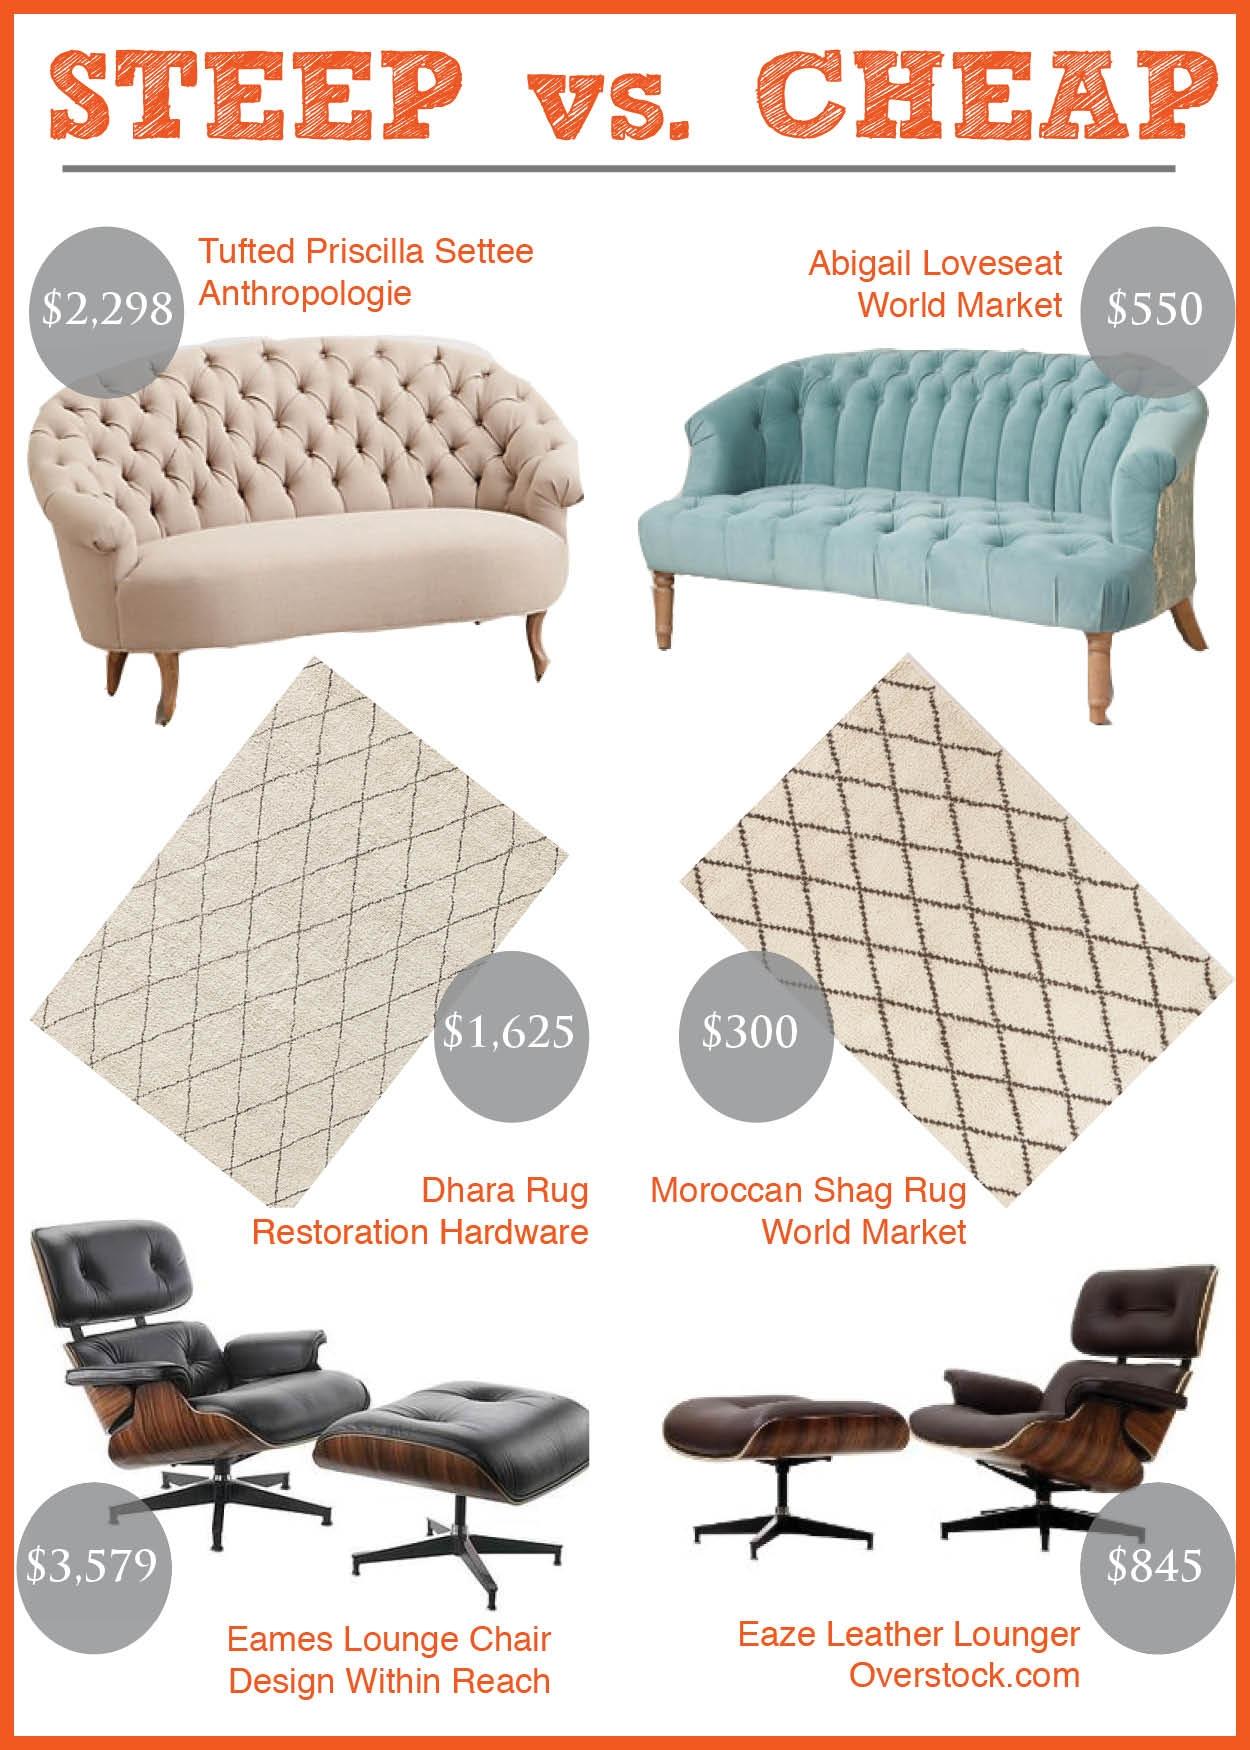 Cheap Tufted Sofa Thesofa Regarding Affordable Tufted Sofa (View 4 of 15)